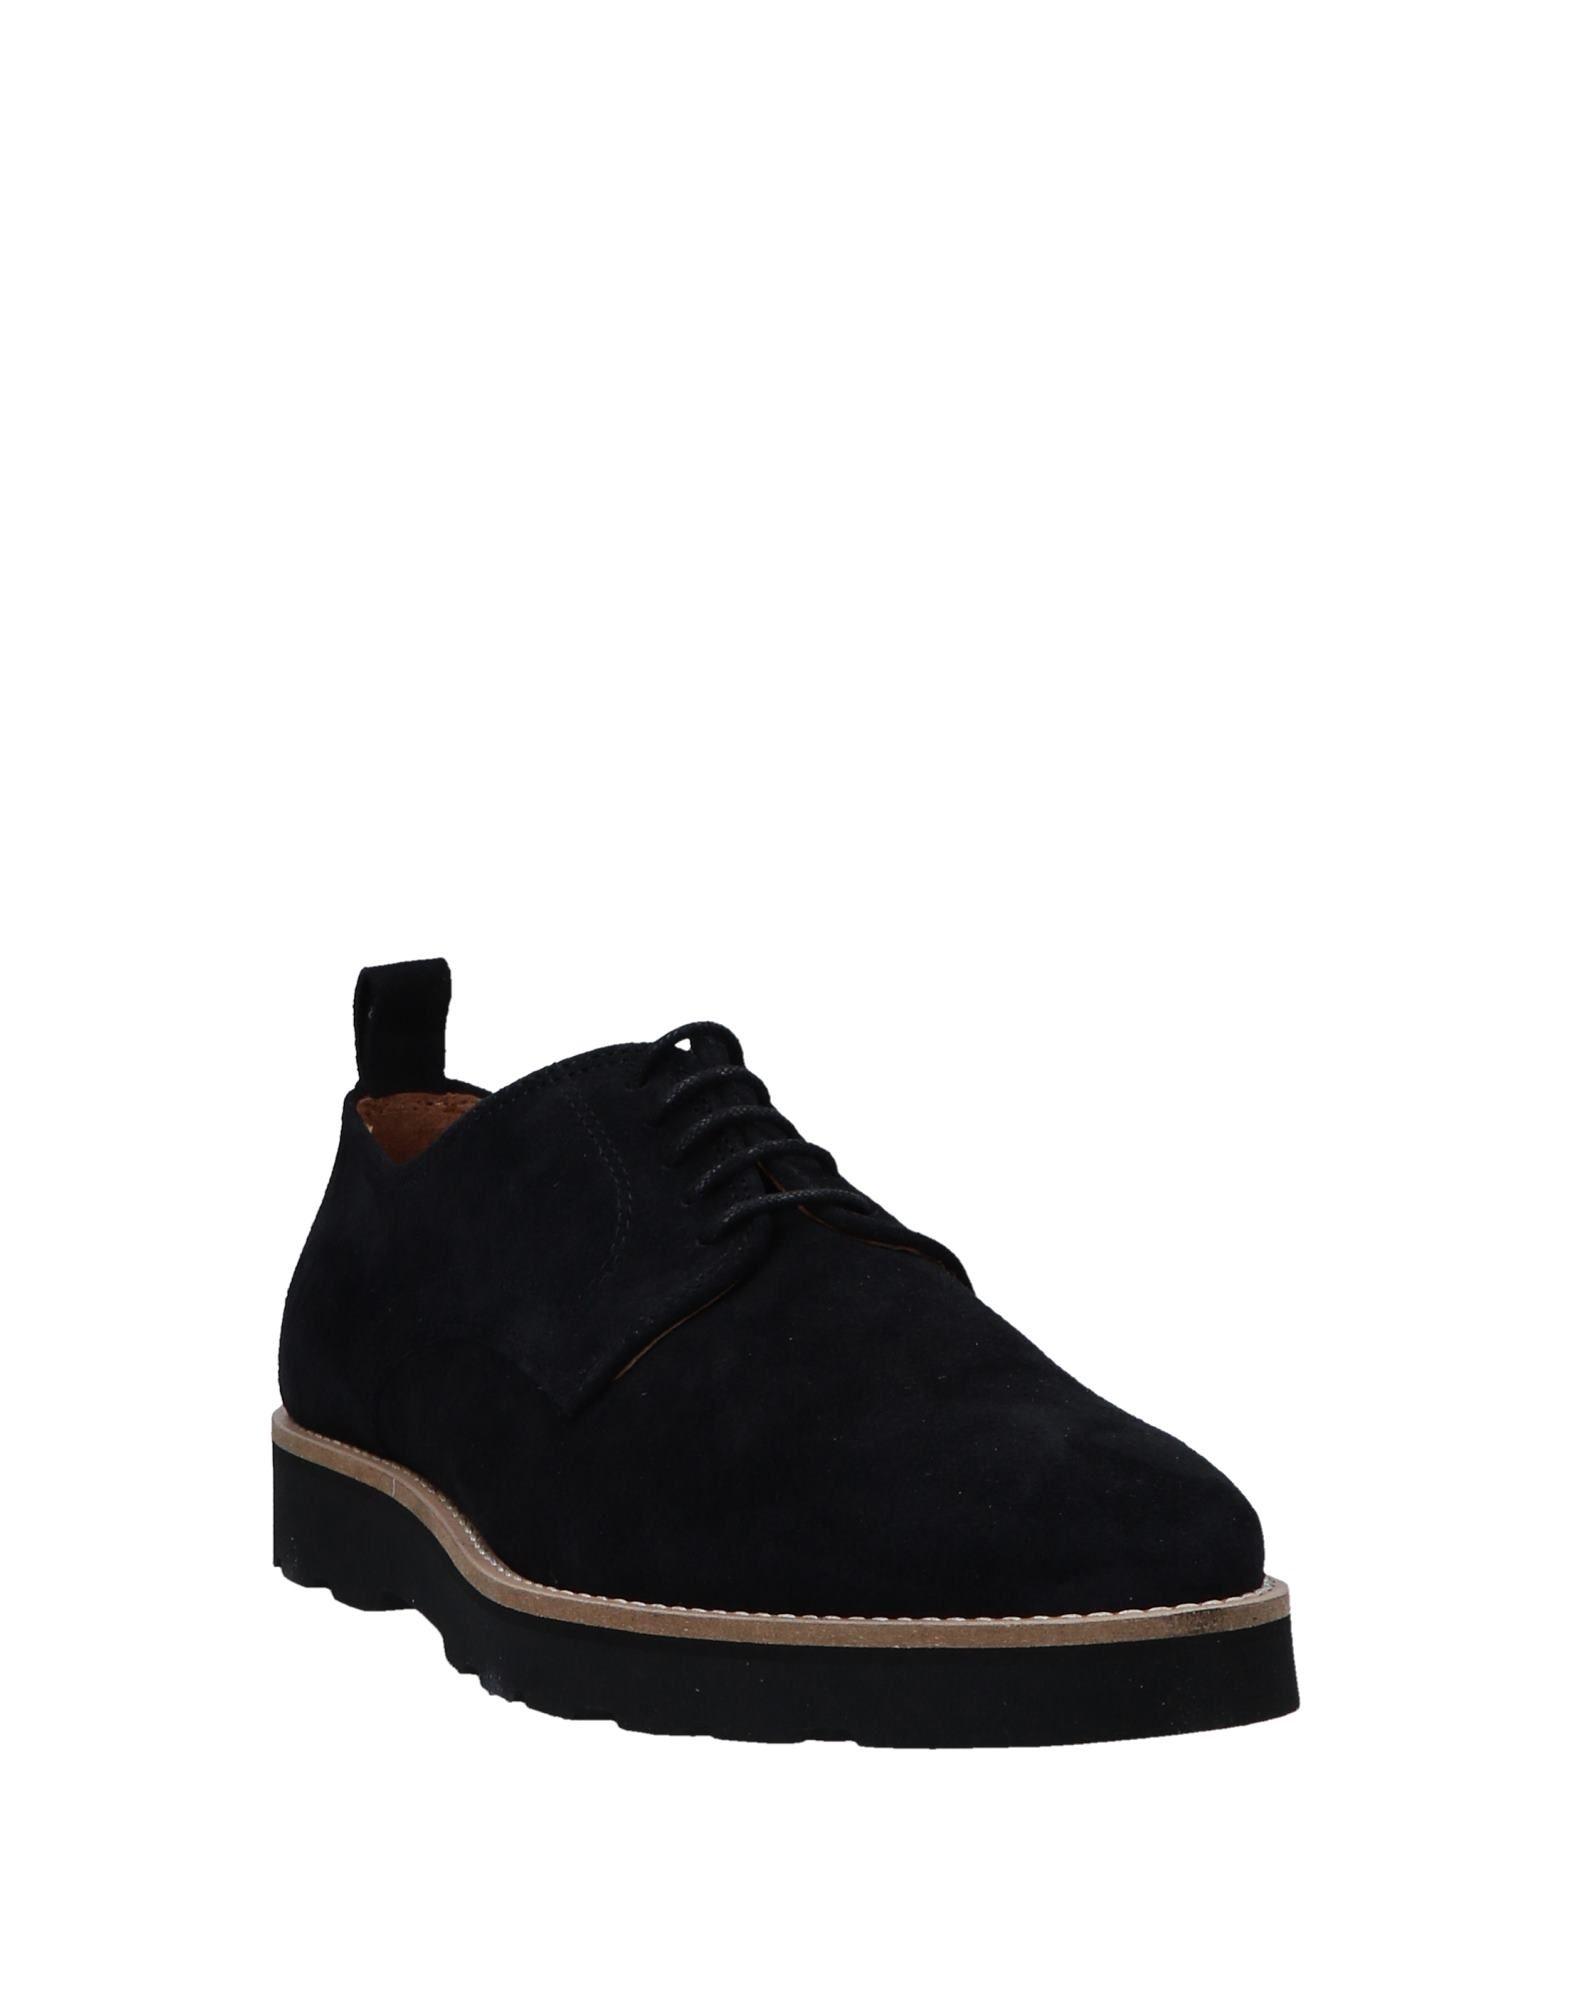 Rabatt echte Schuhe Trussardi Jeans 11546042EQ Schnürschuhe Herren  11546042EQ Jeans f8135f